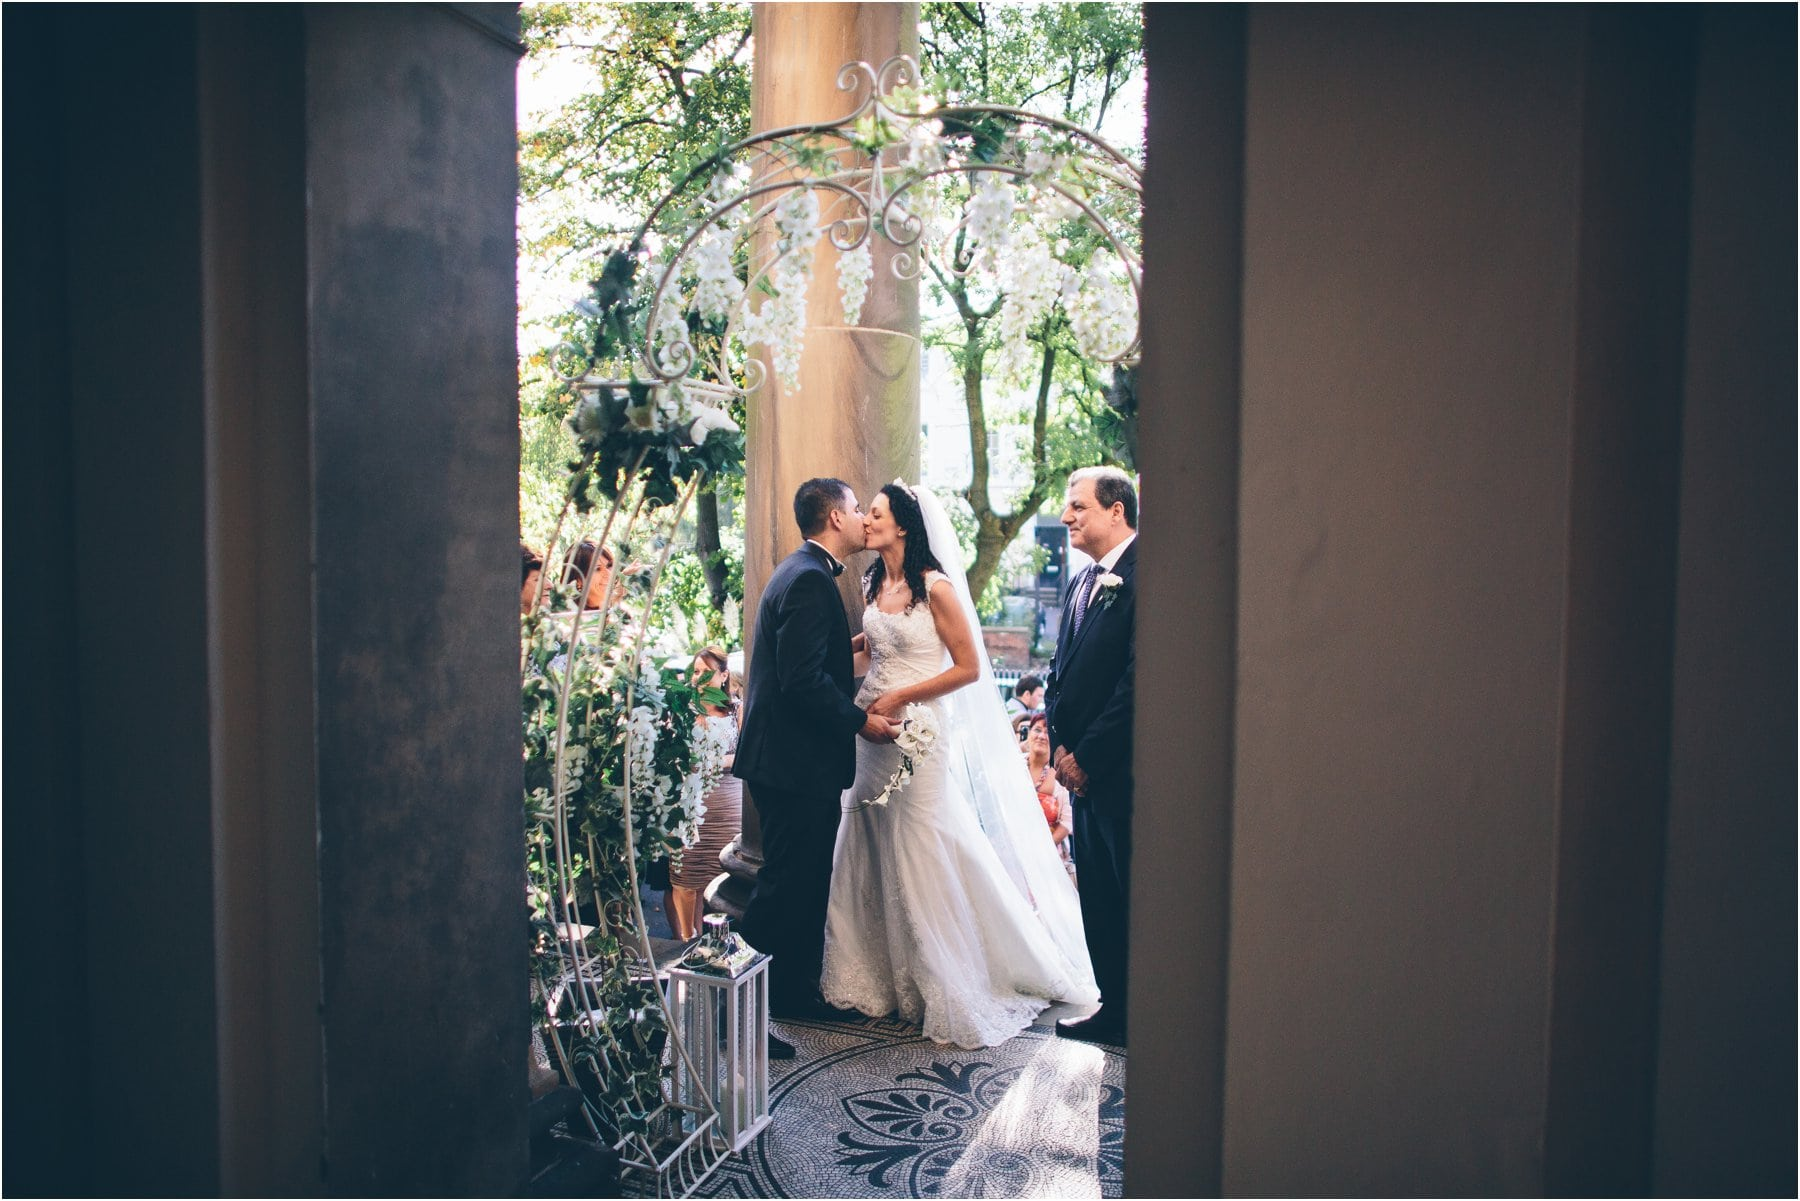 Midland_Manchester_Wedding_Photography_0063